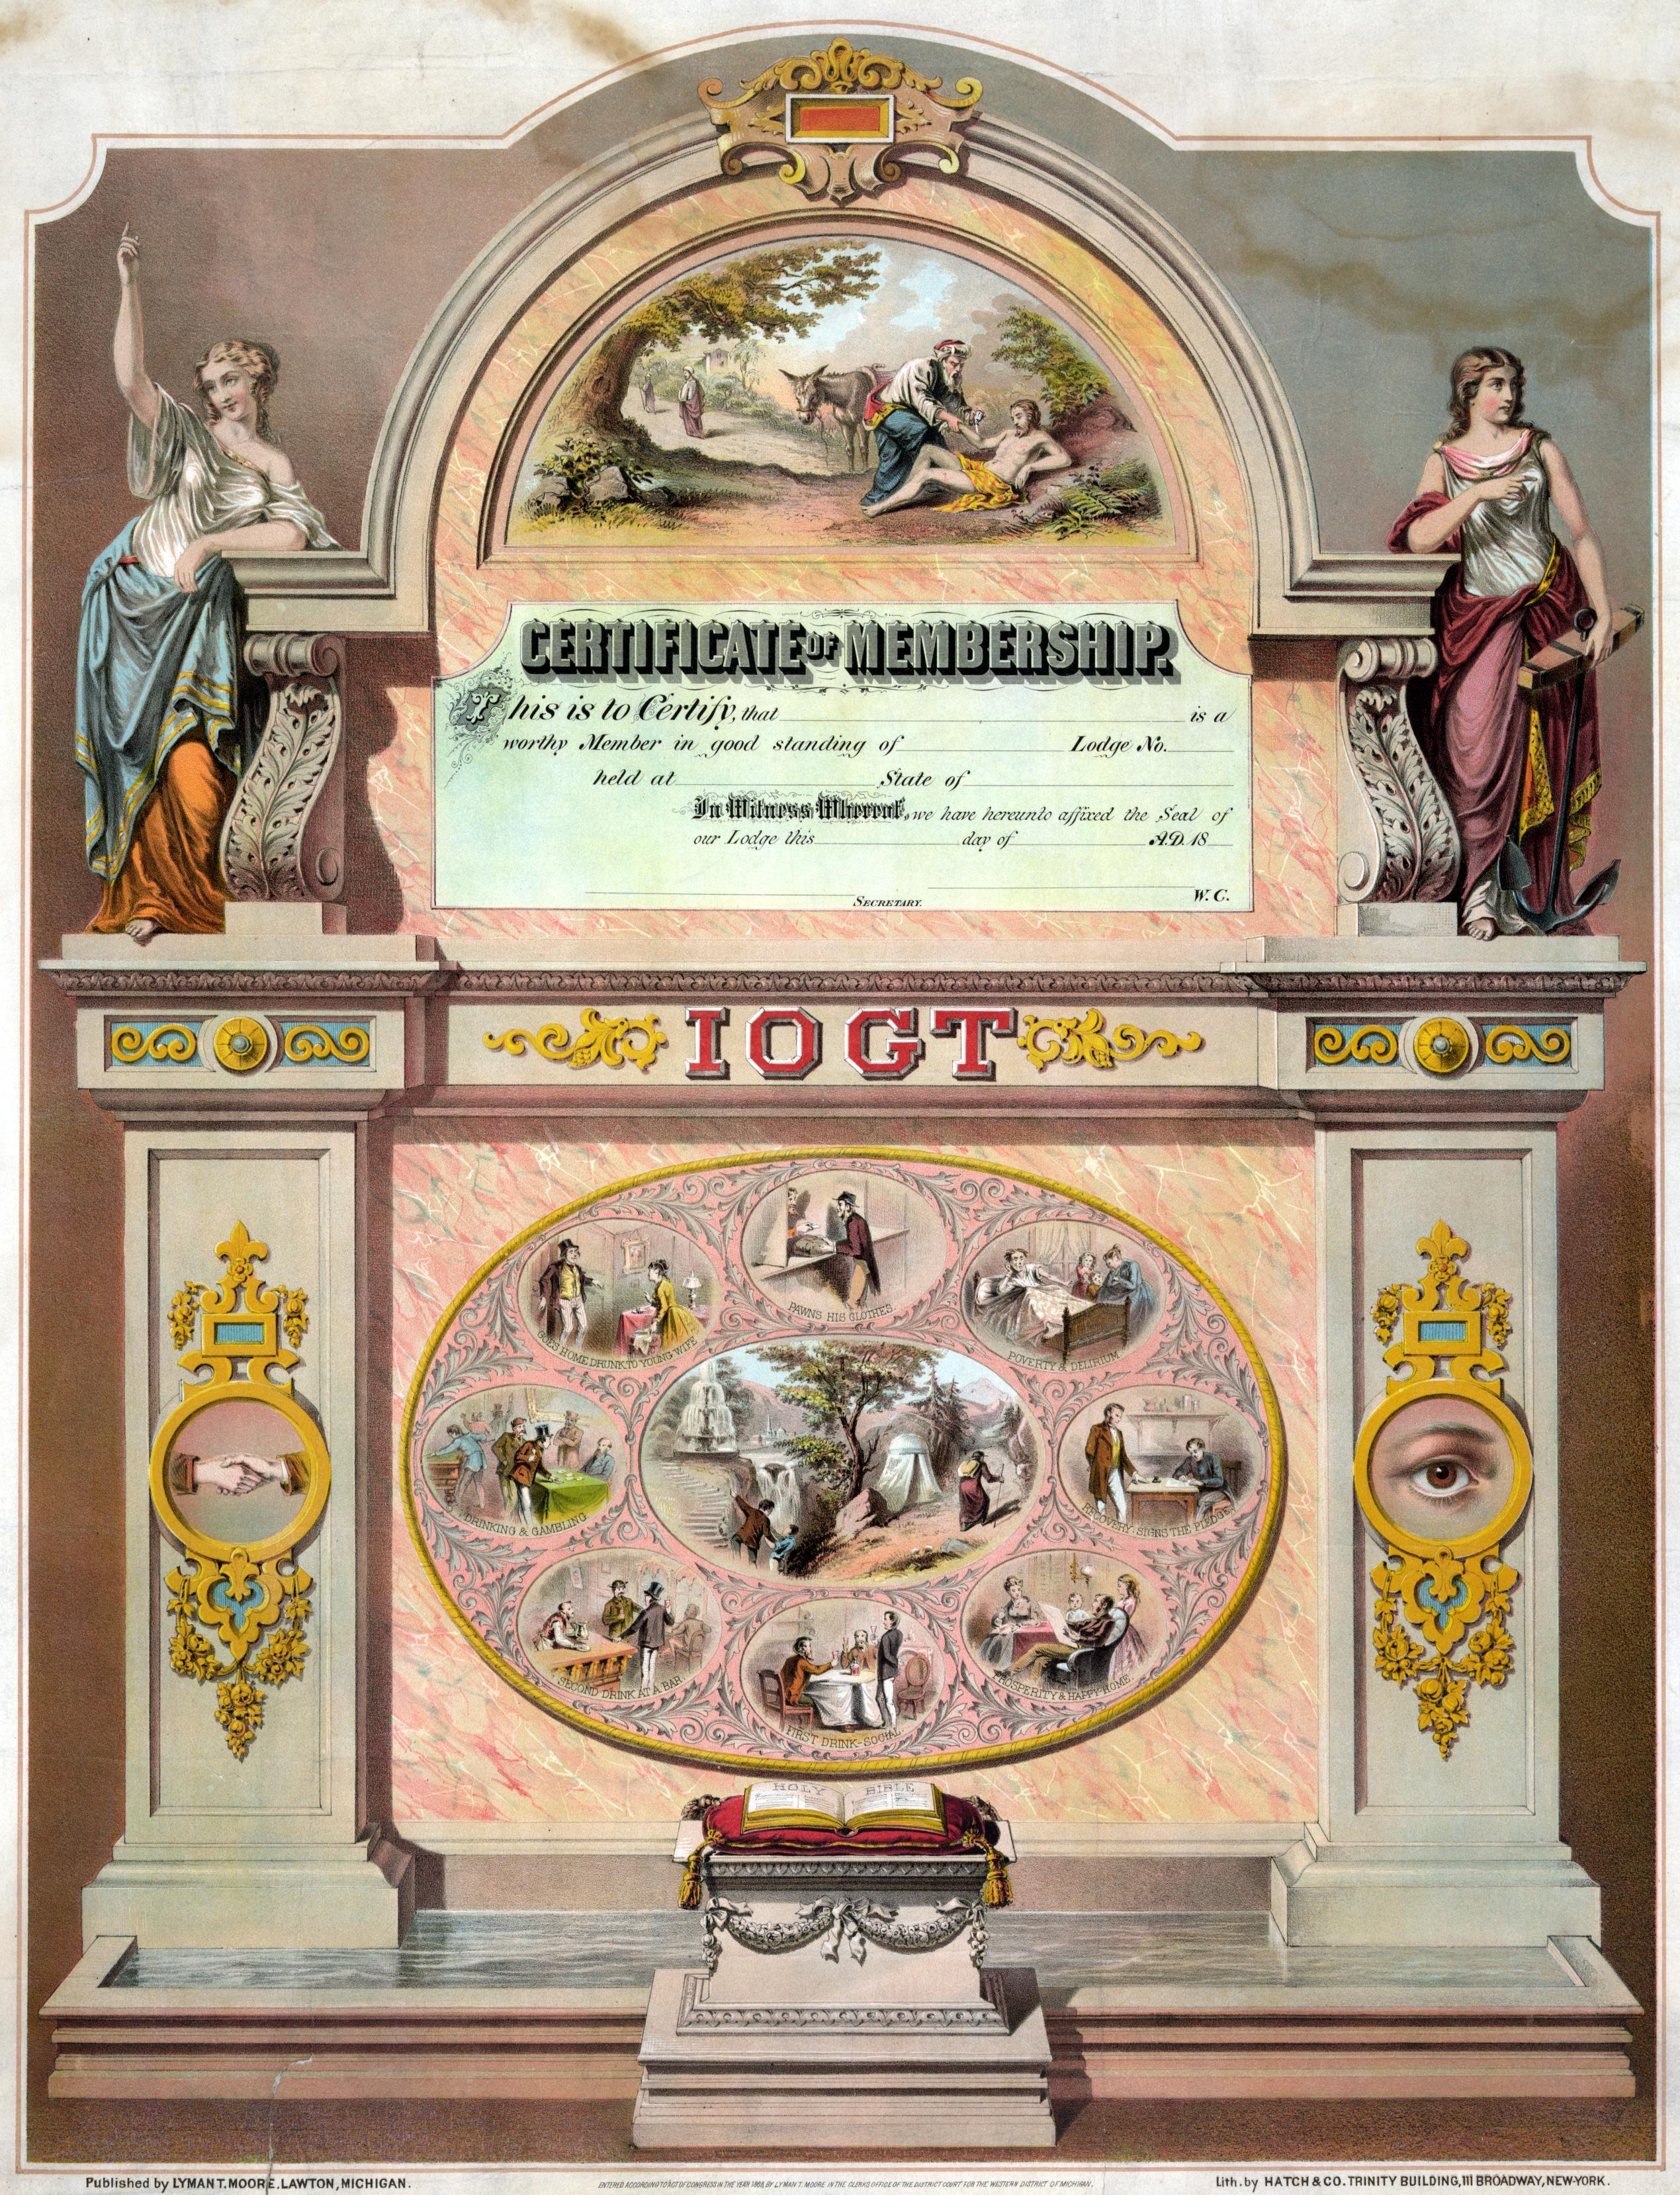 Fileinternational Organisation Of Good Templars Membership